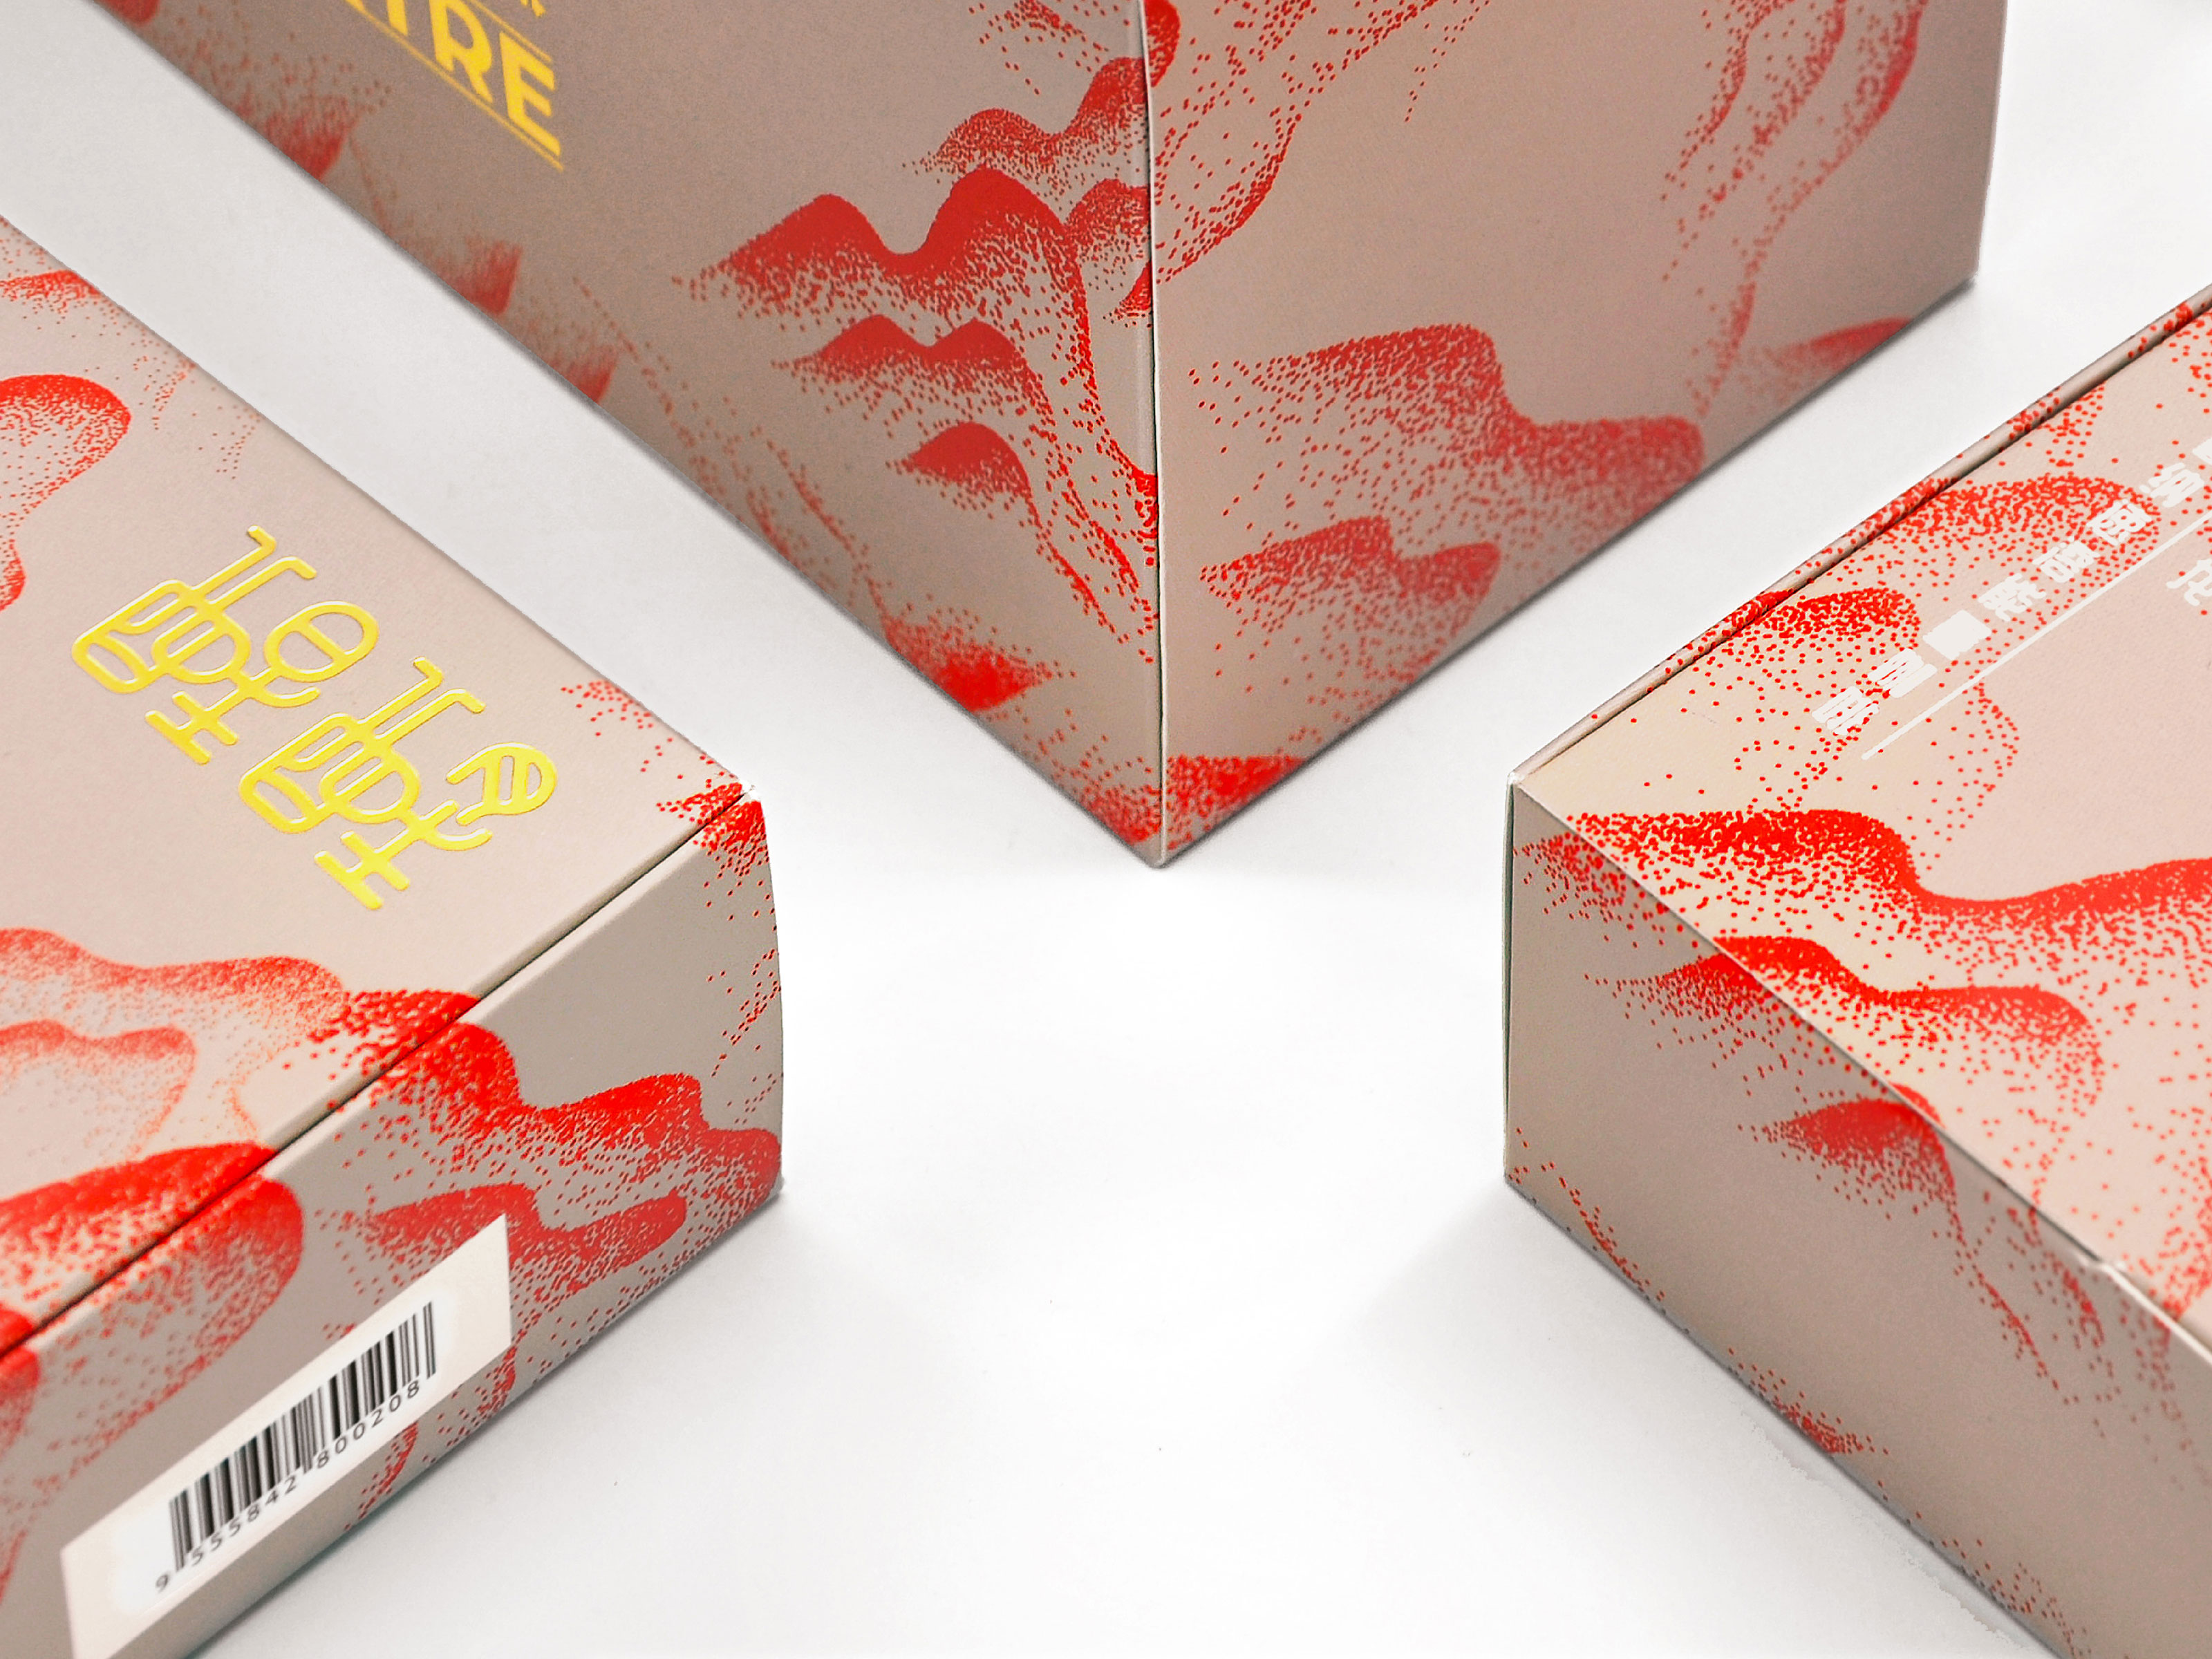 Apaper_Nextre_Xingxing_Folio_3200x2400_FA-07.jpg